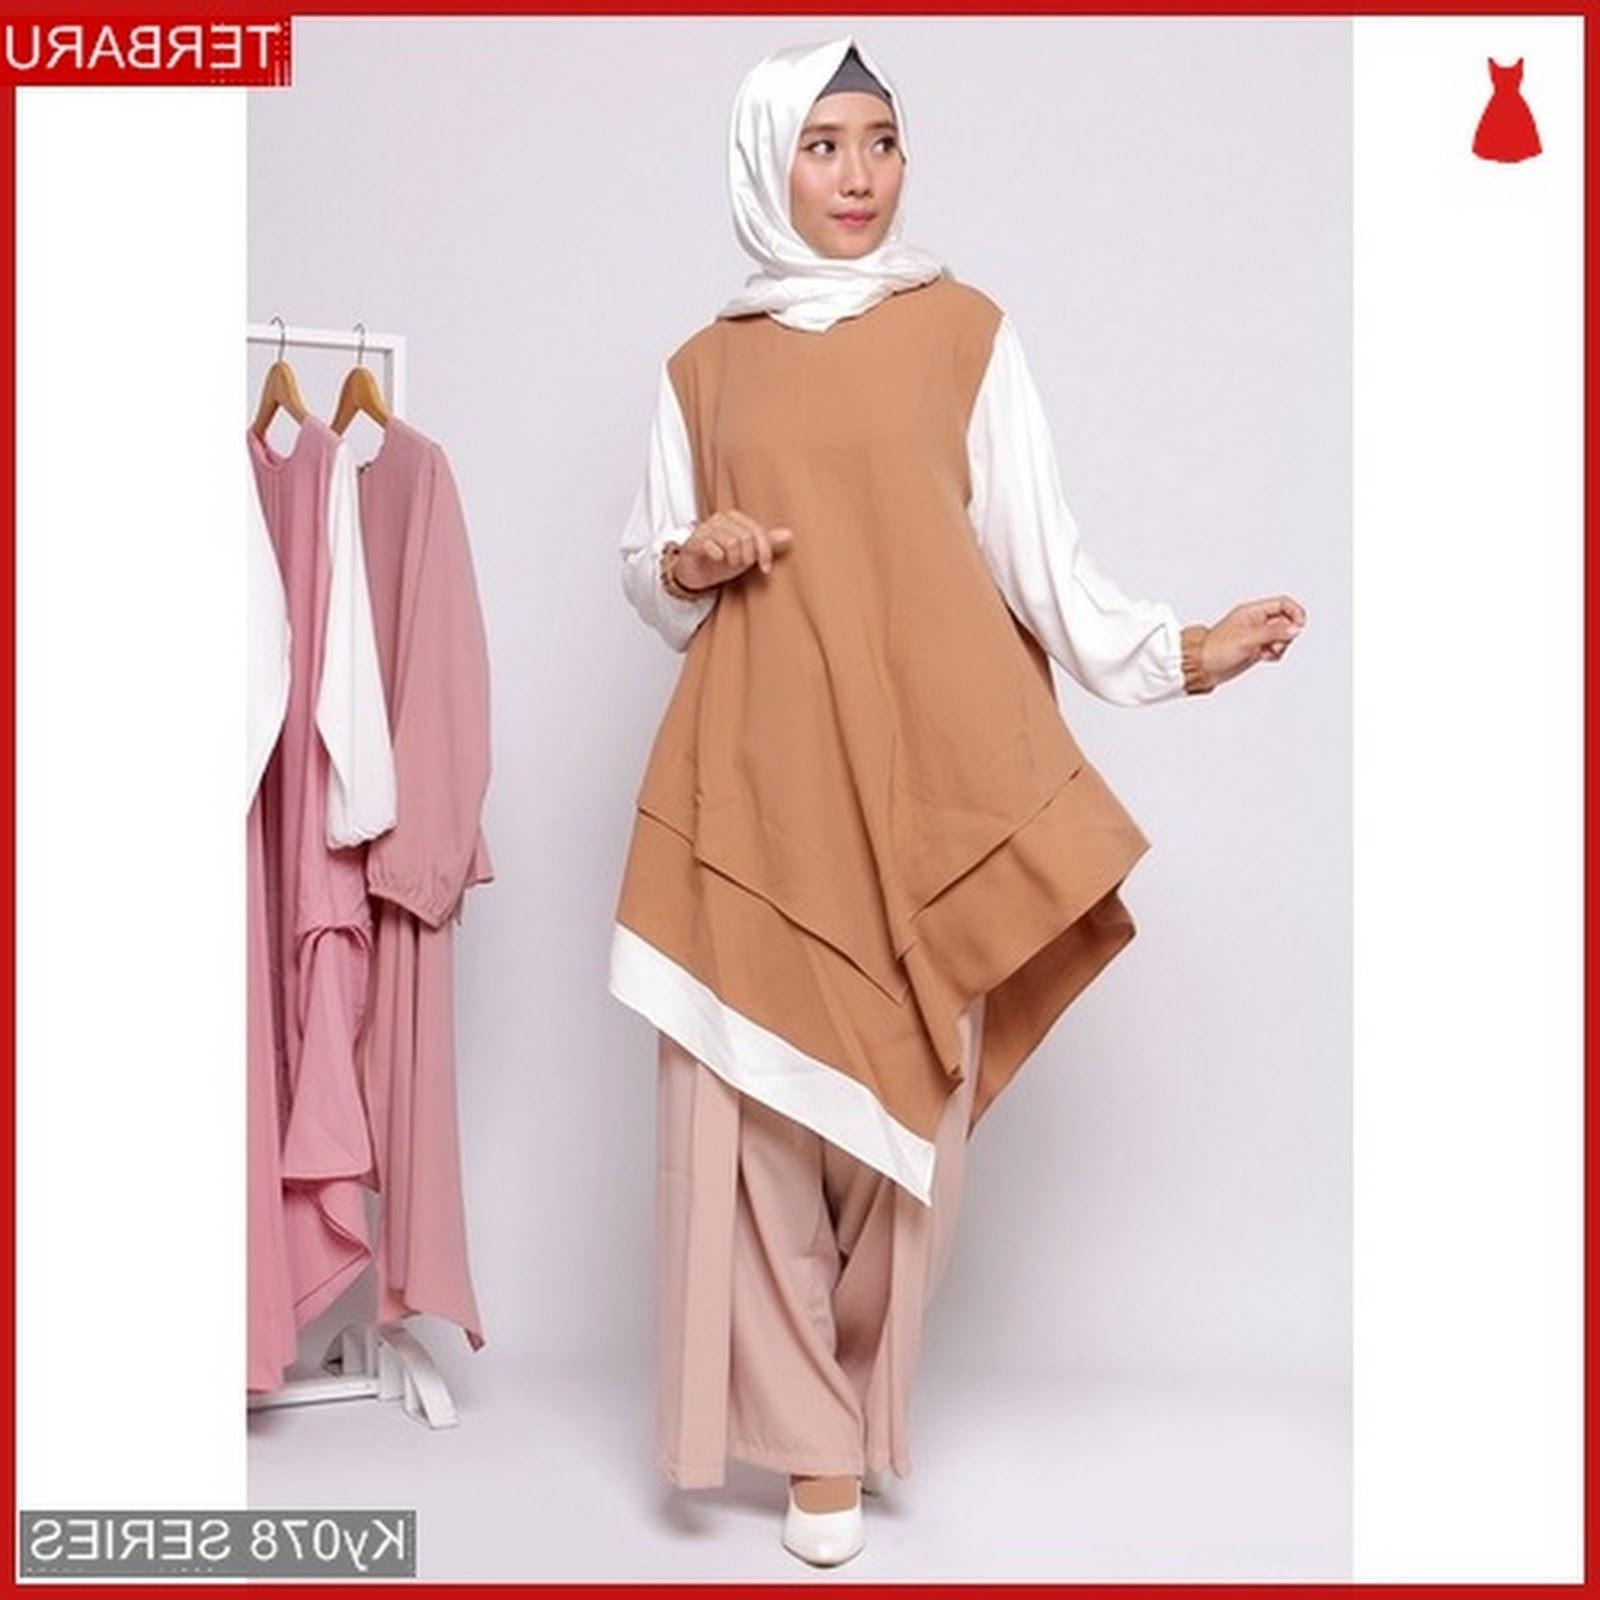 Model Motif Baju Lebaran J7do Dapatkan Baju Muslim Lebaran Paling Keren Terbaru Di Bmg